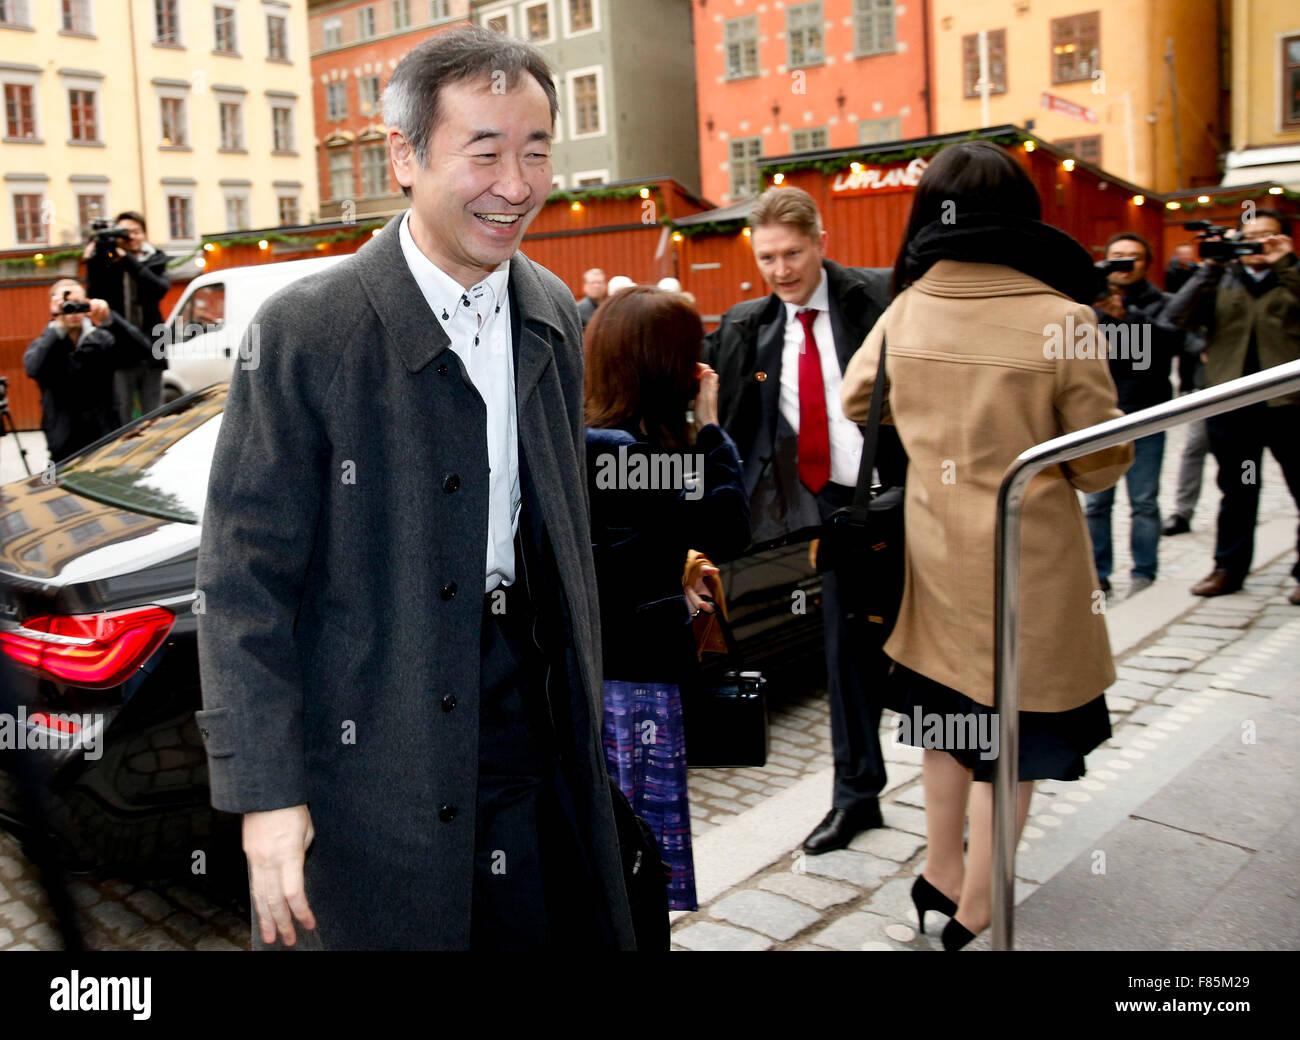 Stockholm, Dec. 6. 10th Dec, 2015. The 2015 Nobel Prize laureate for physics Takaaki Kajita arrives at Nobel museum Stock Photo